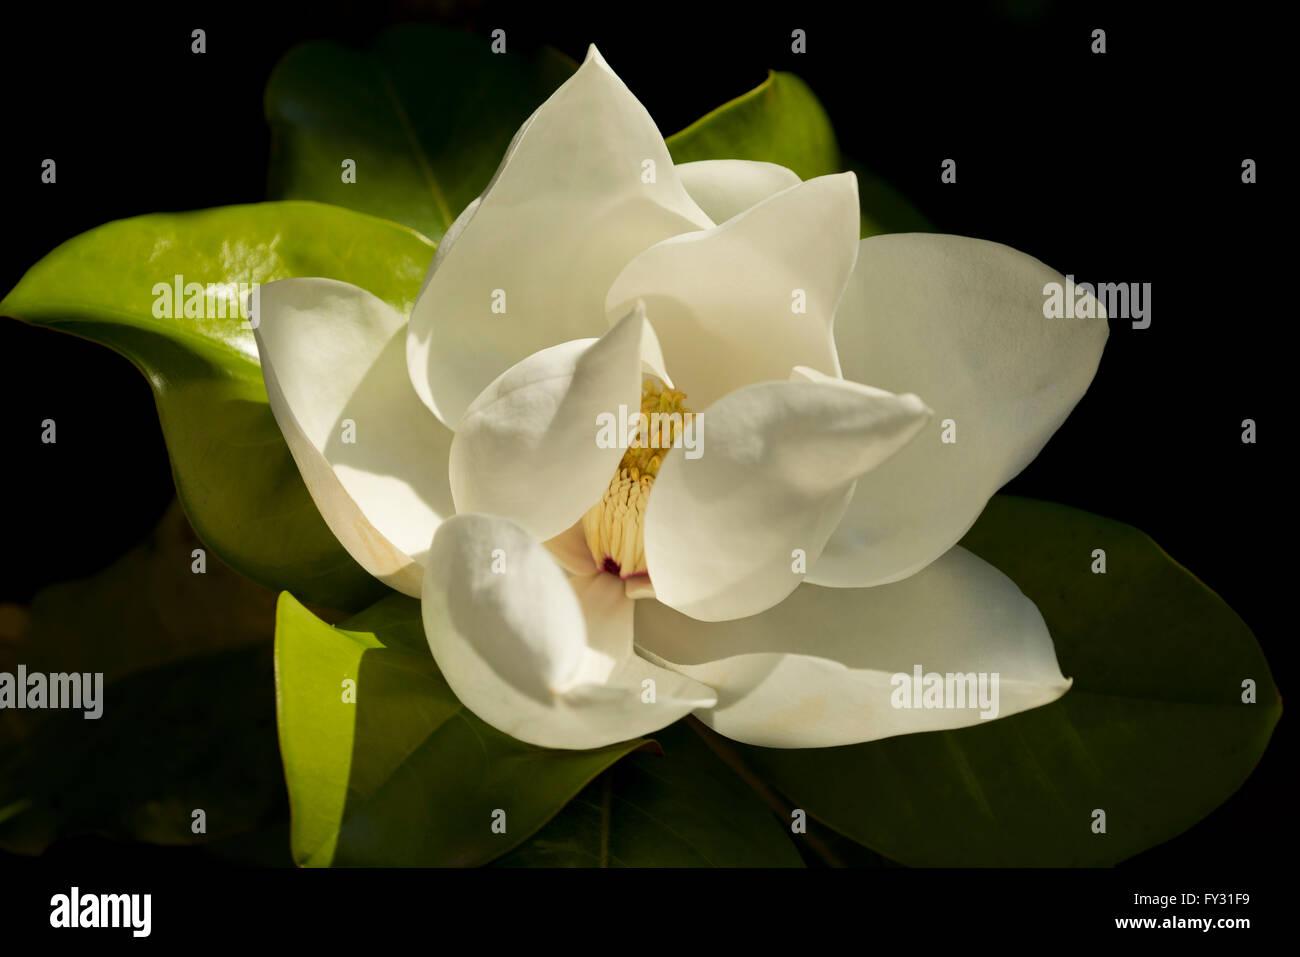 Magnolia Grandiflora Goliath A Summer Flowering Magnolia At The